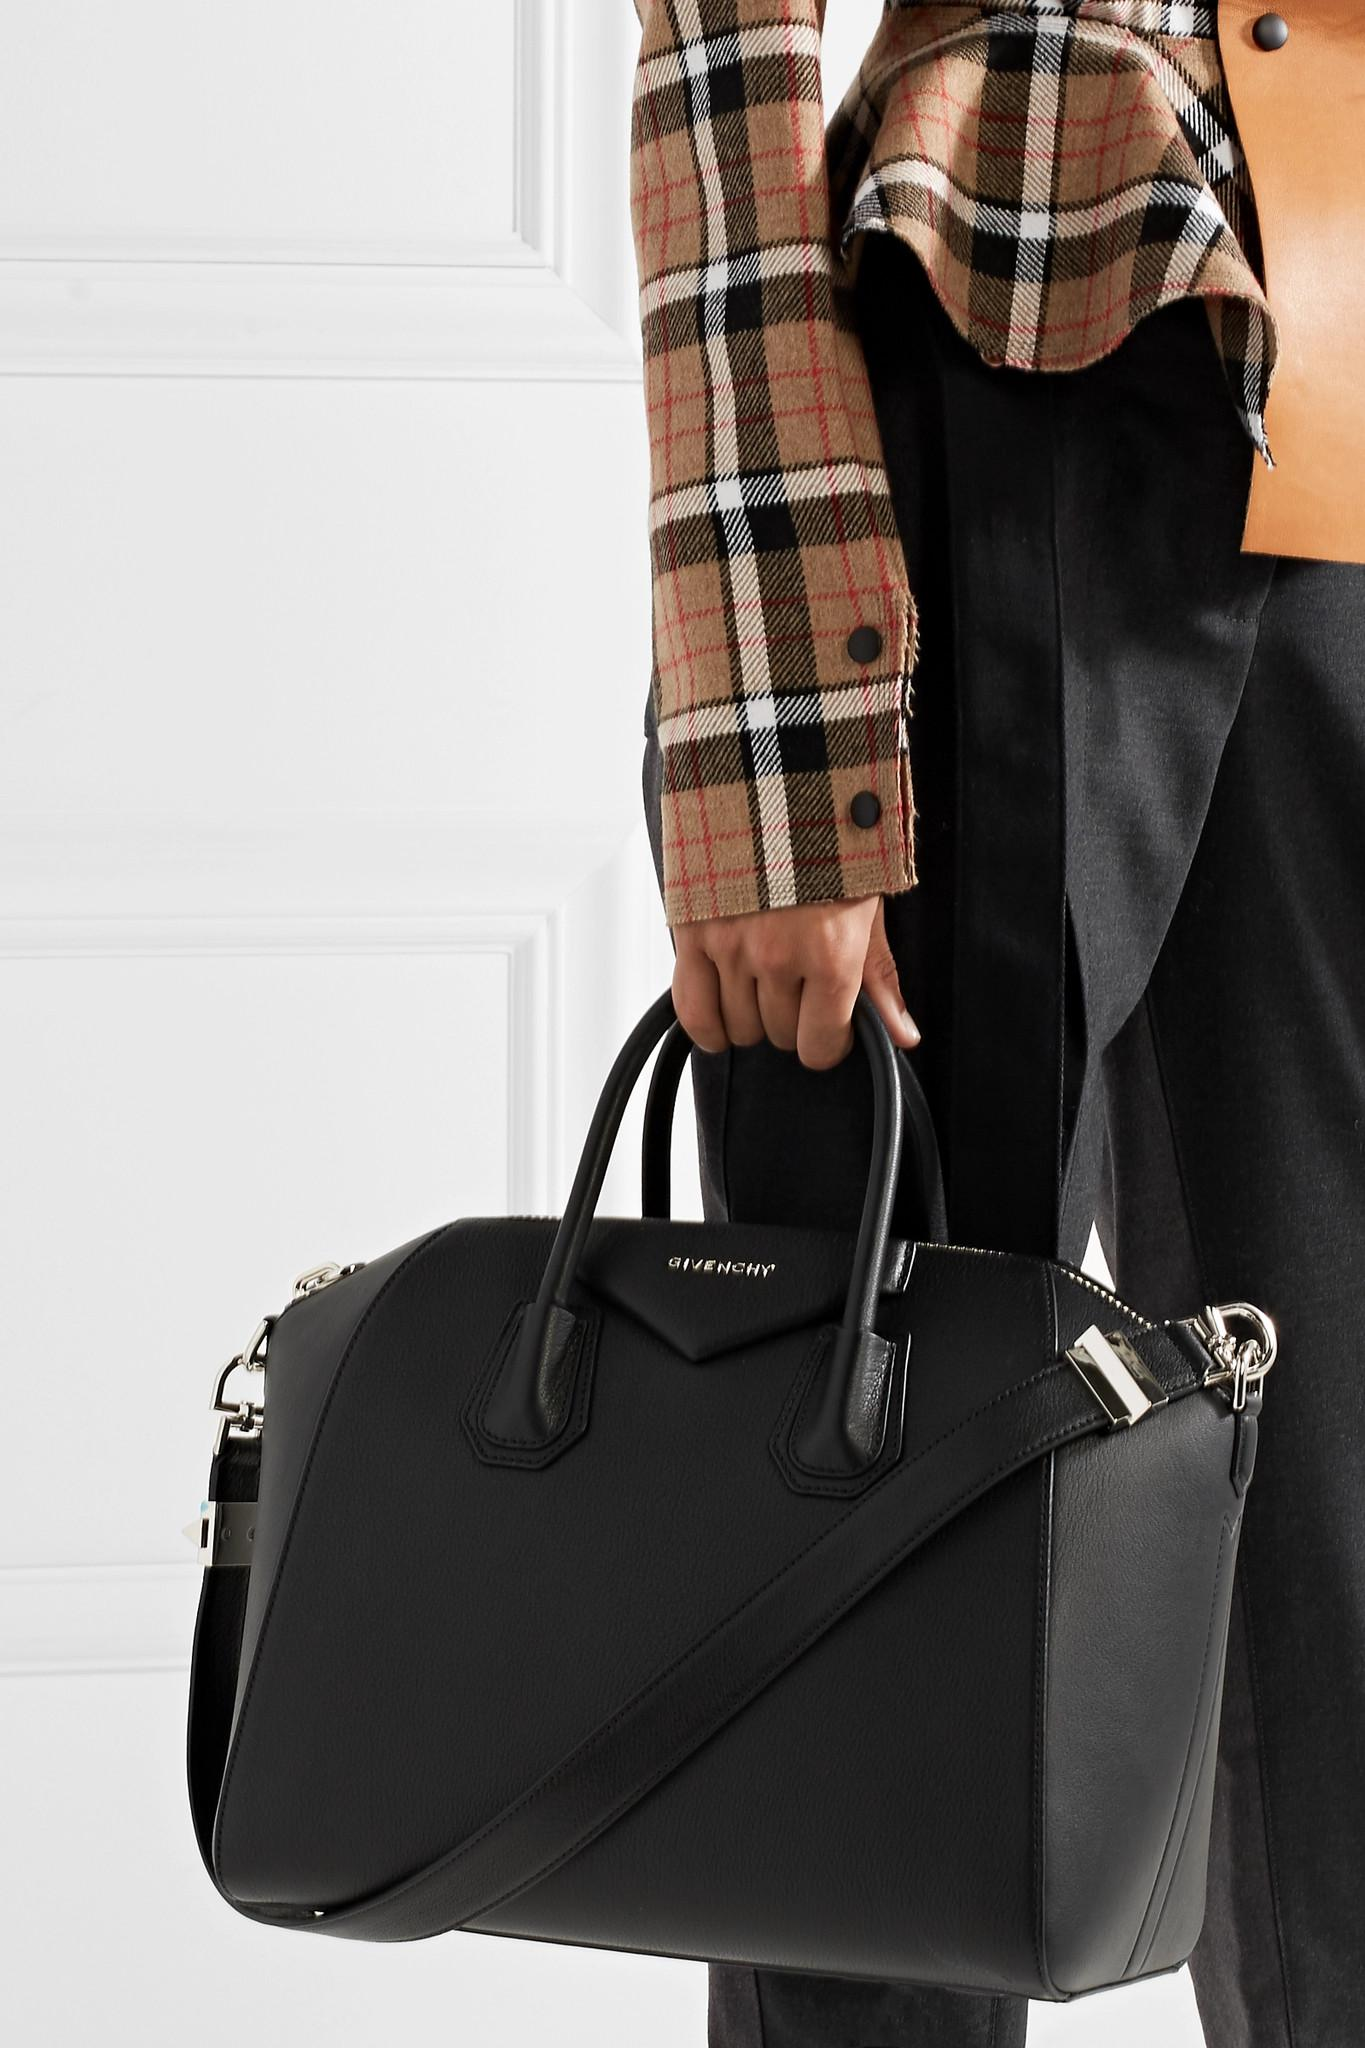 e7a8074a52b Givenchy - Black Antigona Medium Leather Tote - Lyst. View fullscreen